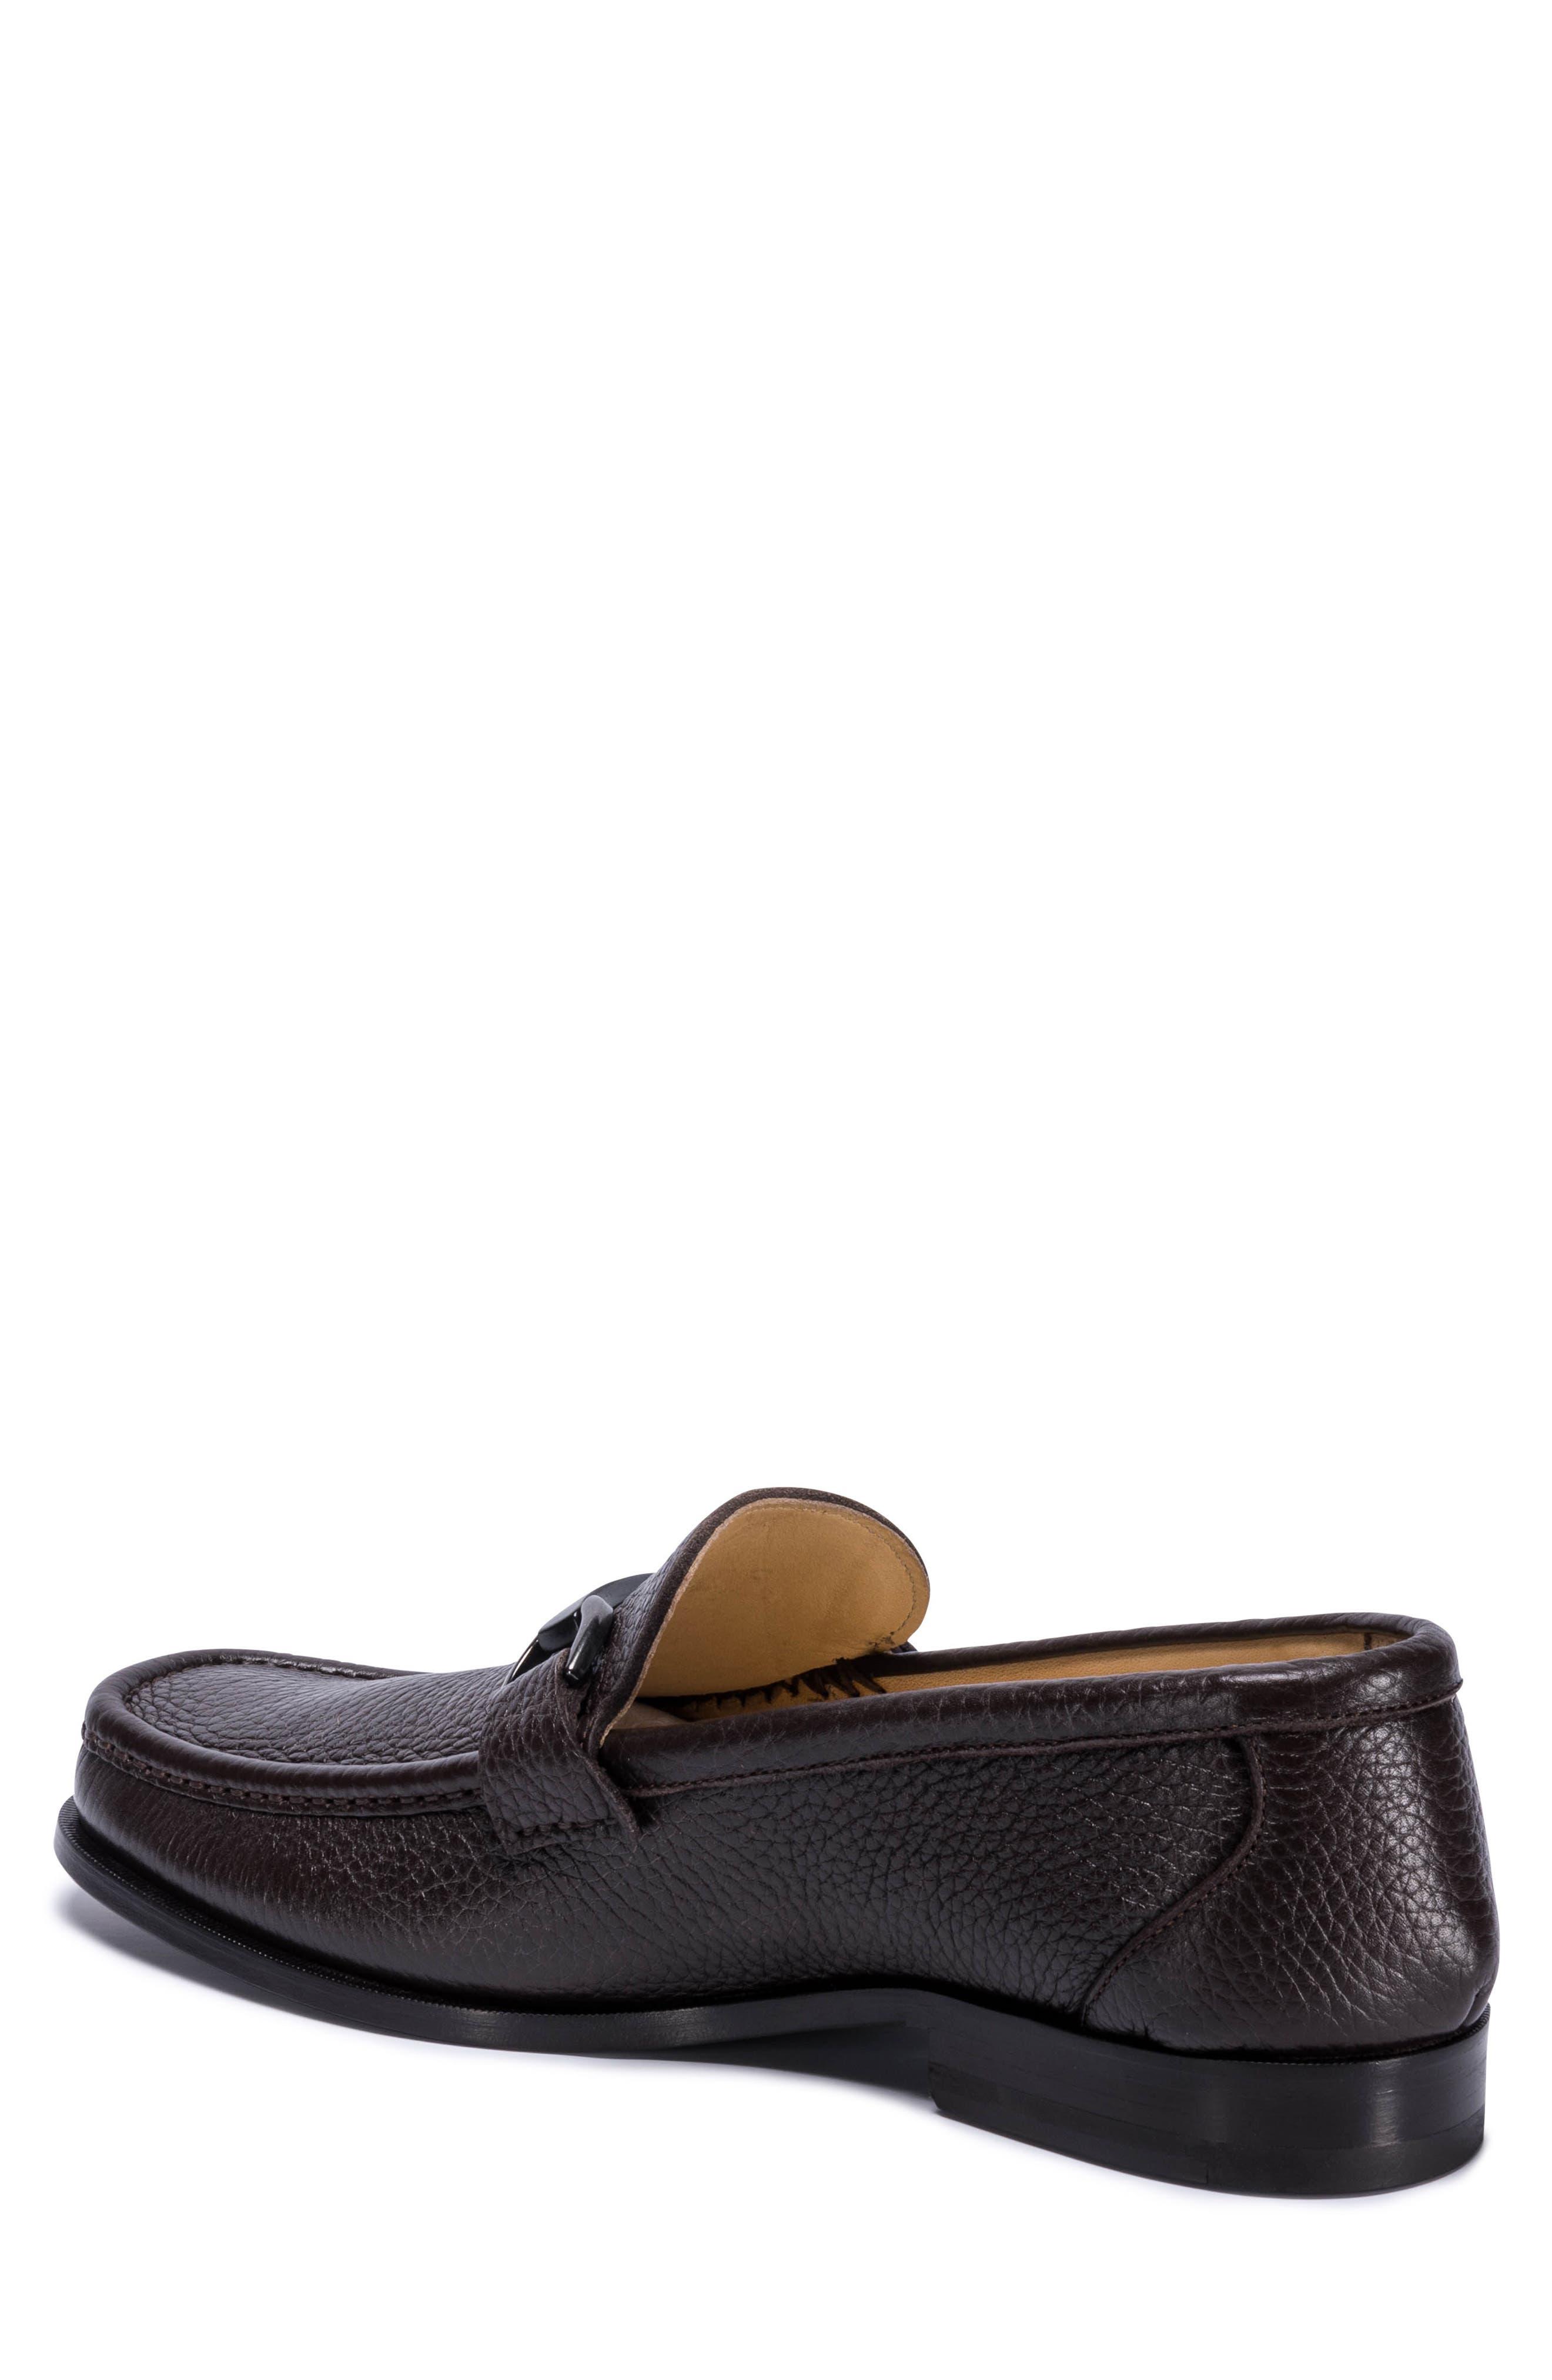 Padua Bit Loafer,                             Alternate thumbnail 2, color,                             Brown Leather